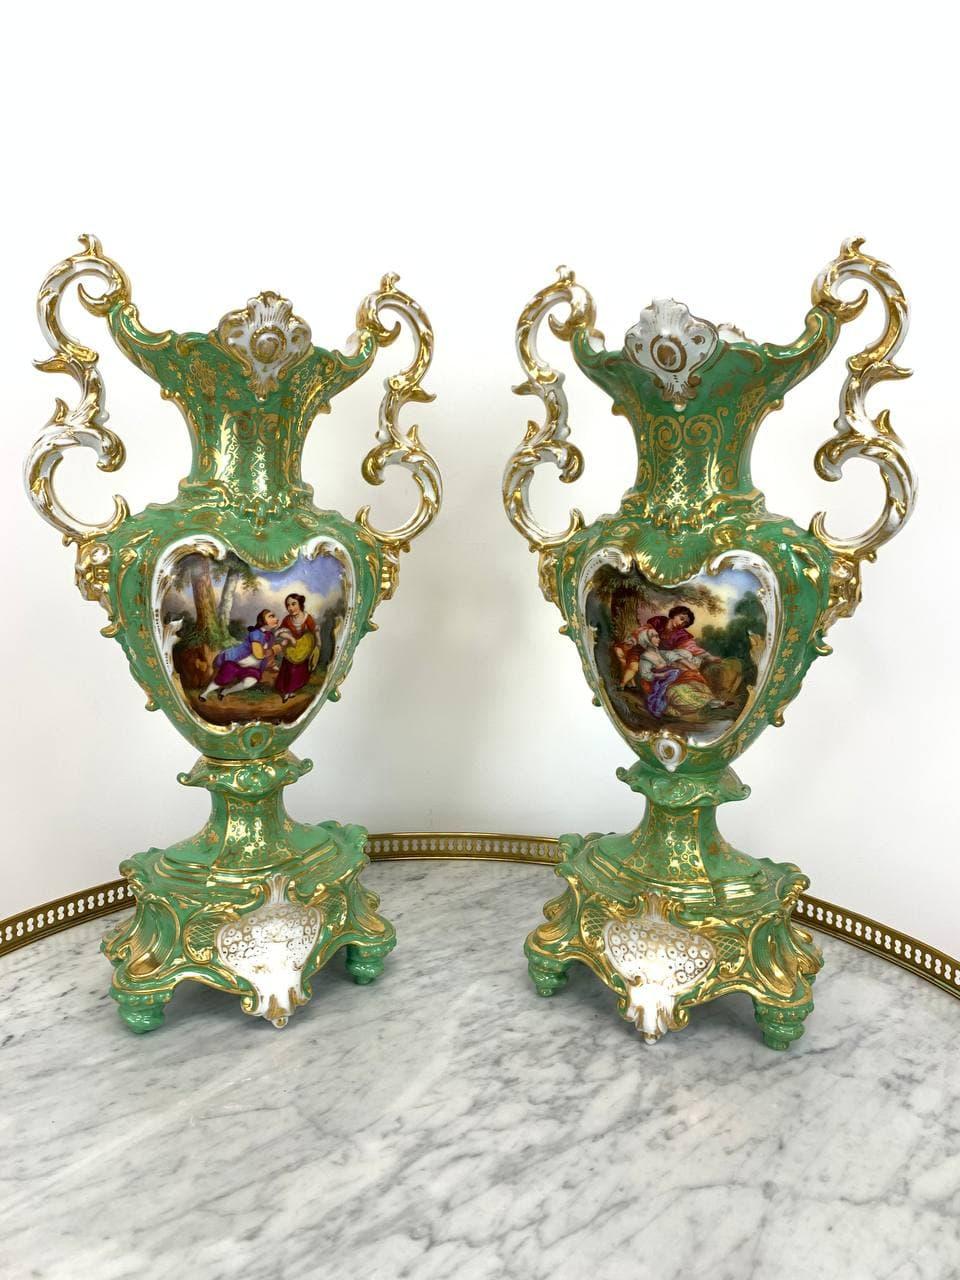 Антикварная пара ваз мануфактуры Vieux Paris